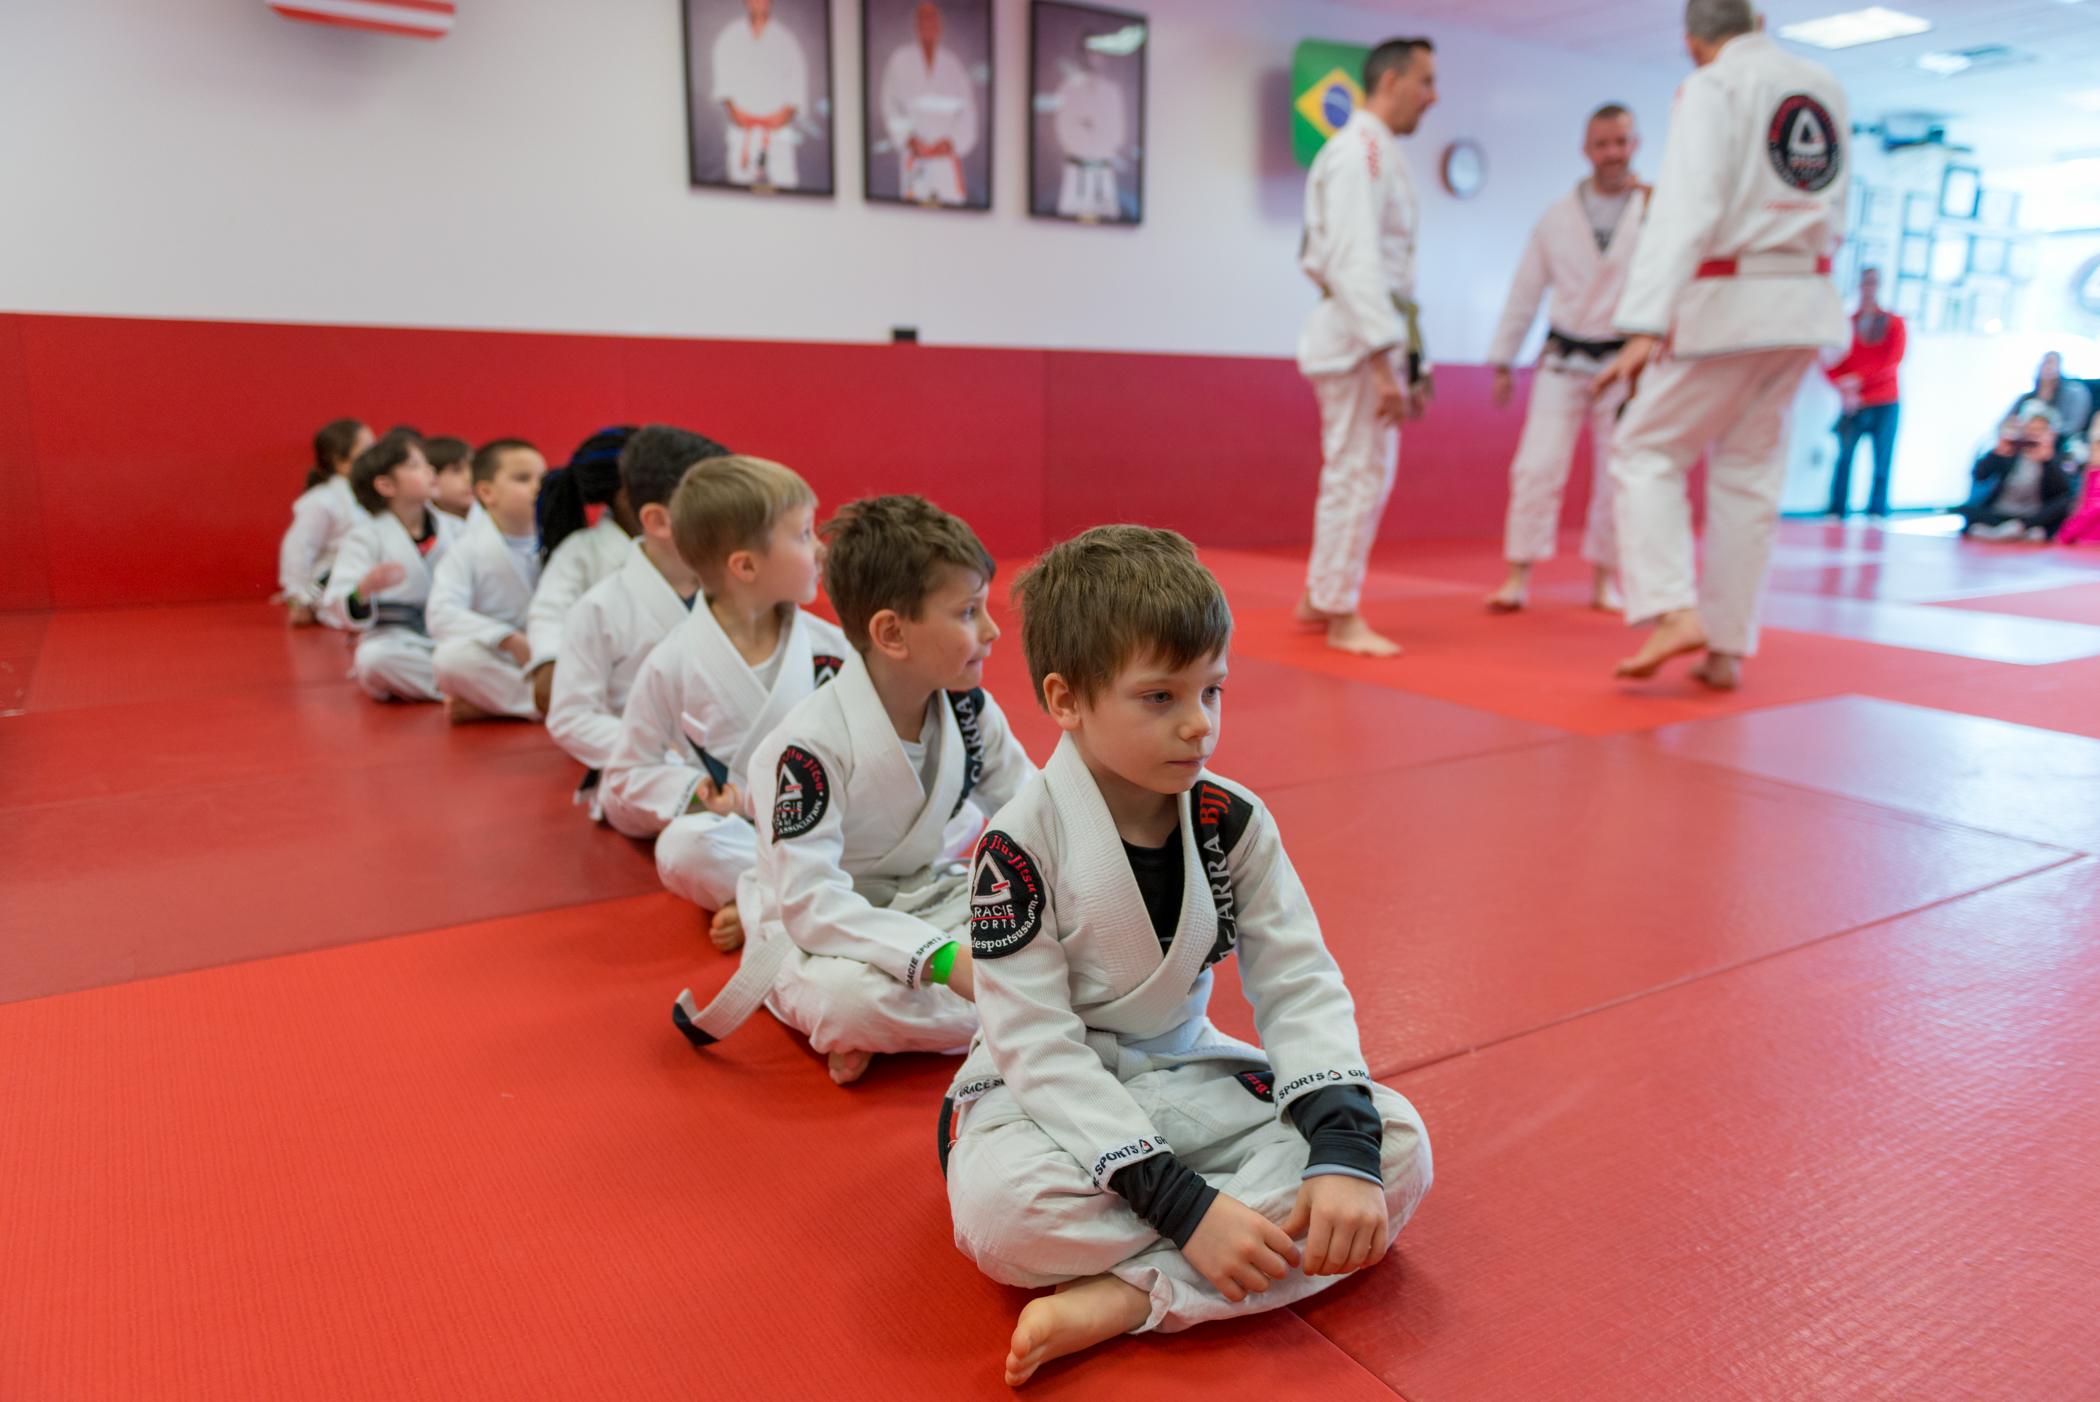 Gracie-Sports-Kids-8.jpg